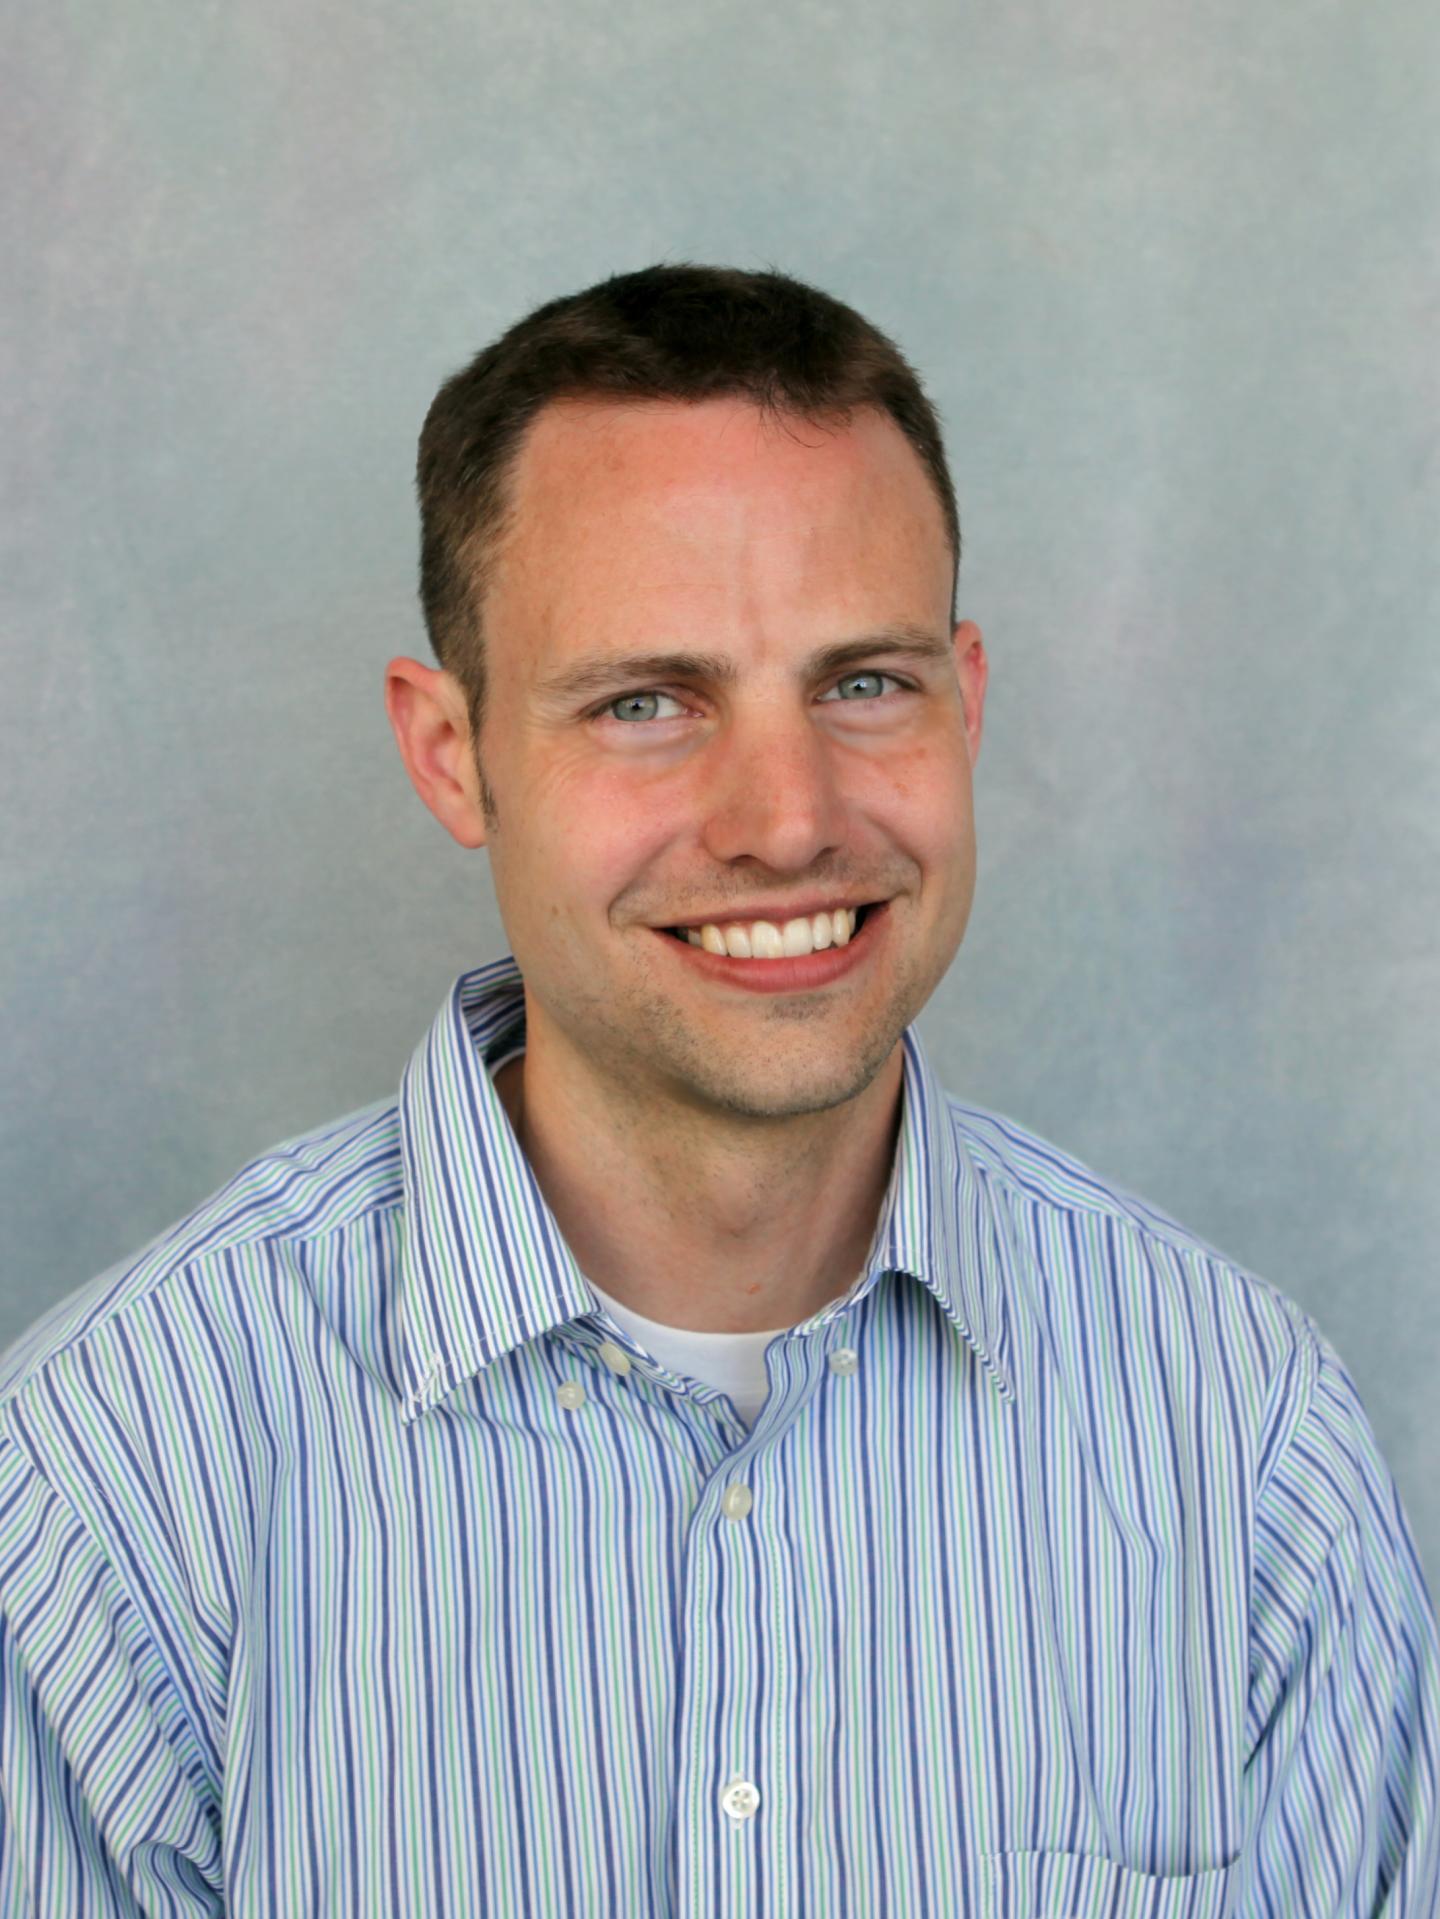 Steven Cavallo, University of Oklahoma